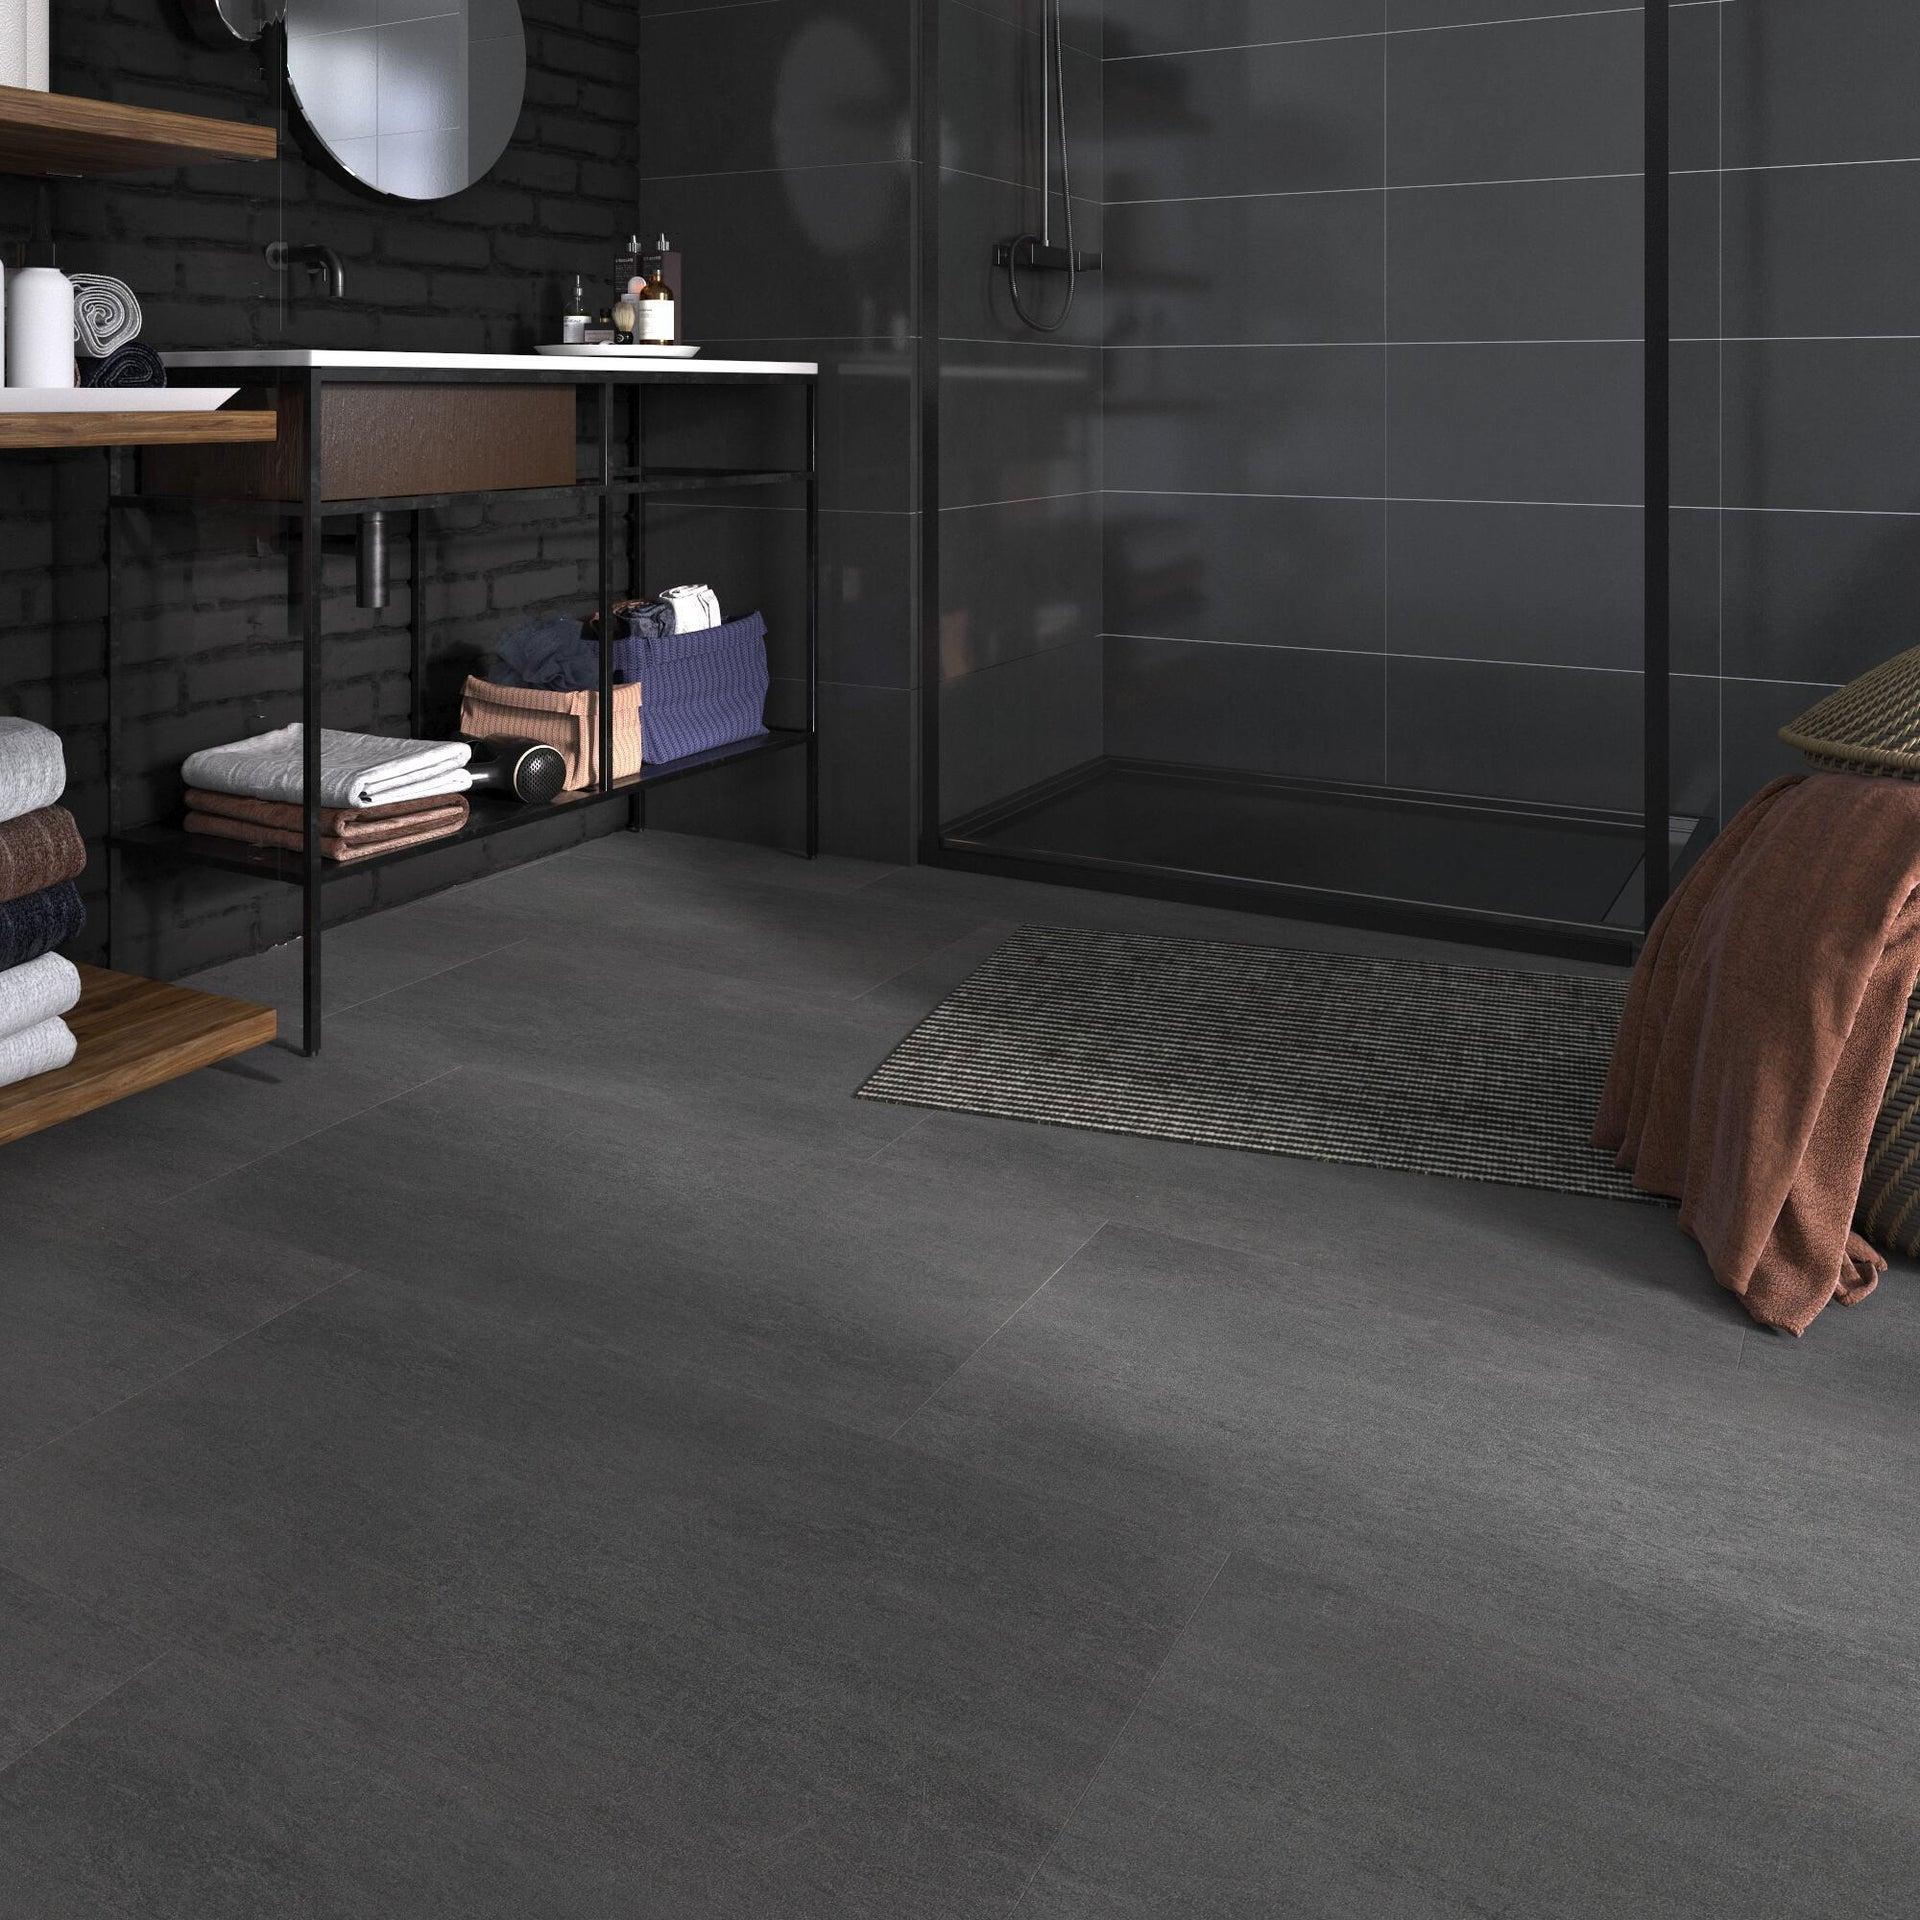 Pavimento PVC flottante clic+ Art For New Sp 4.2 mm nero - 13